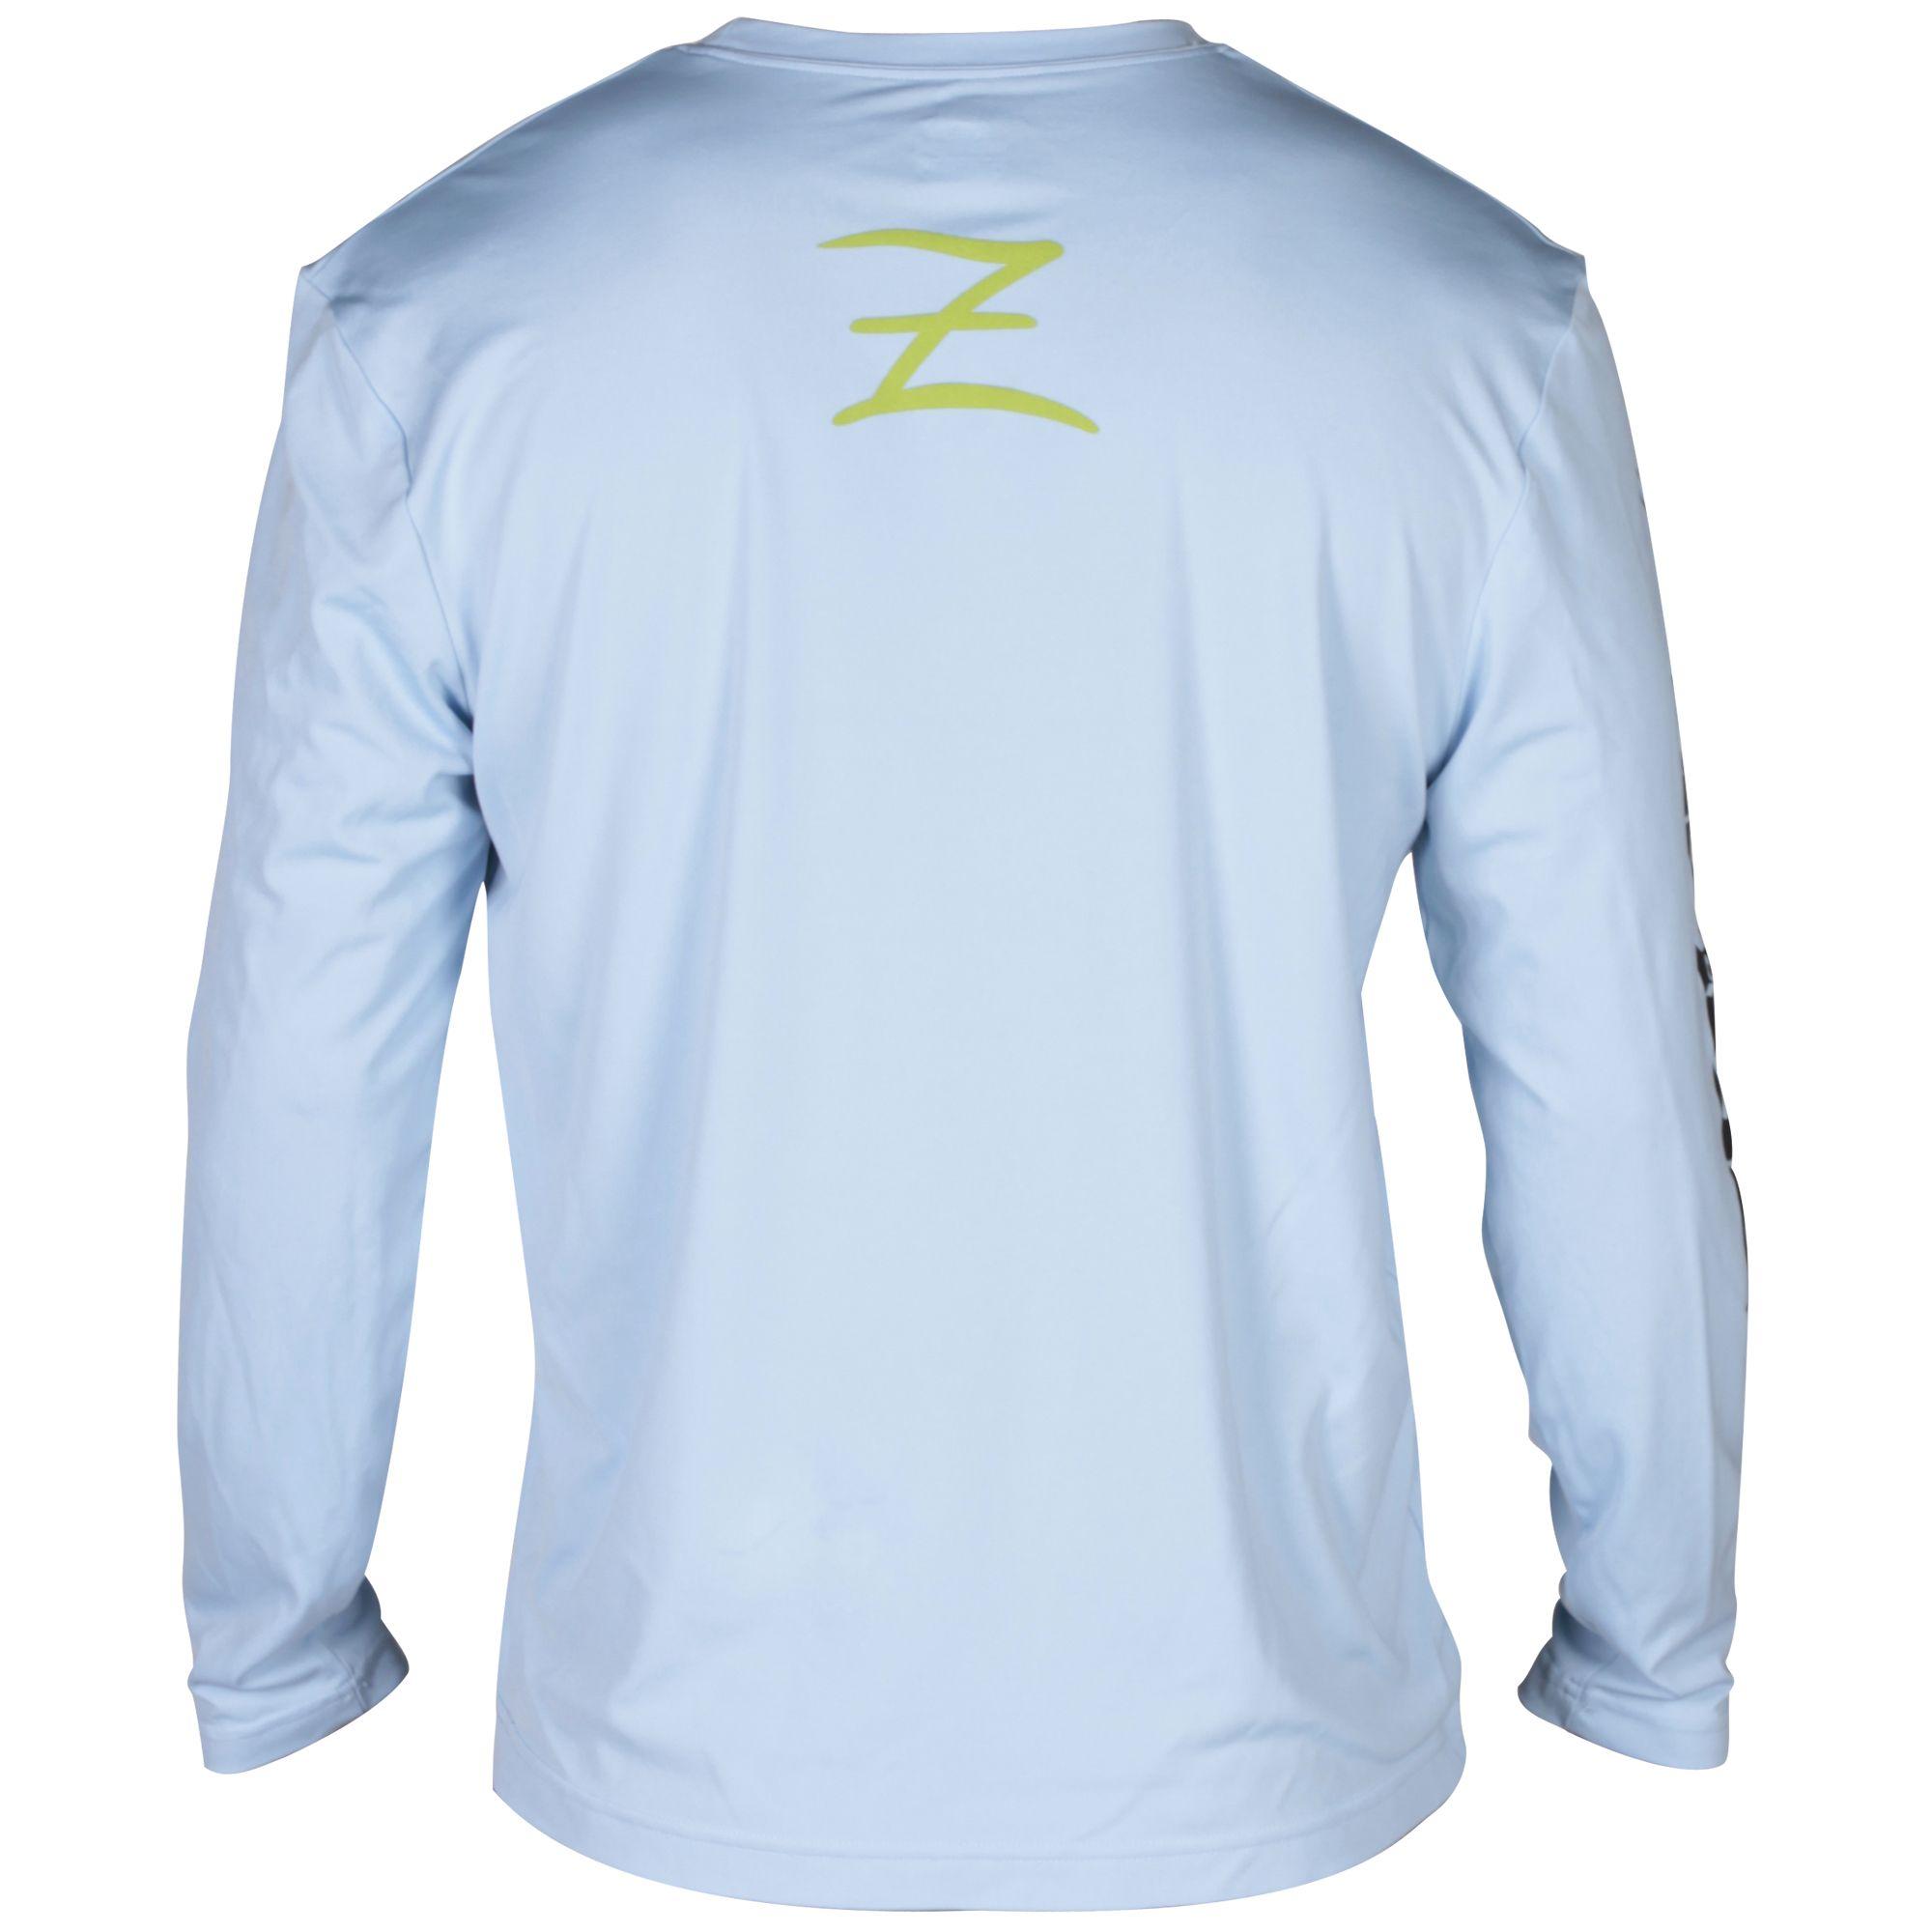 Light blue fishing shirt back uv protection pinterest for Uv fishing shirts